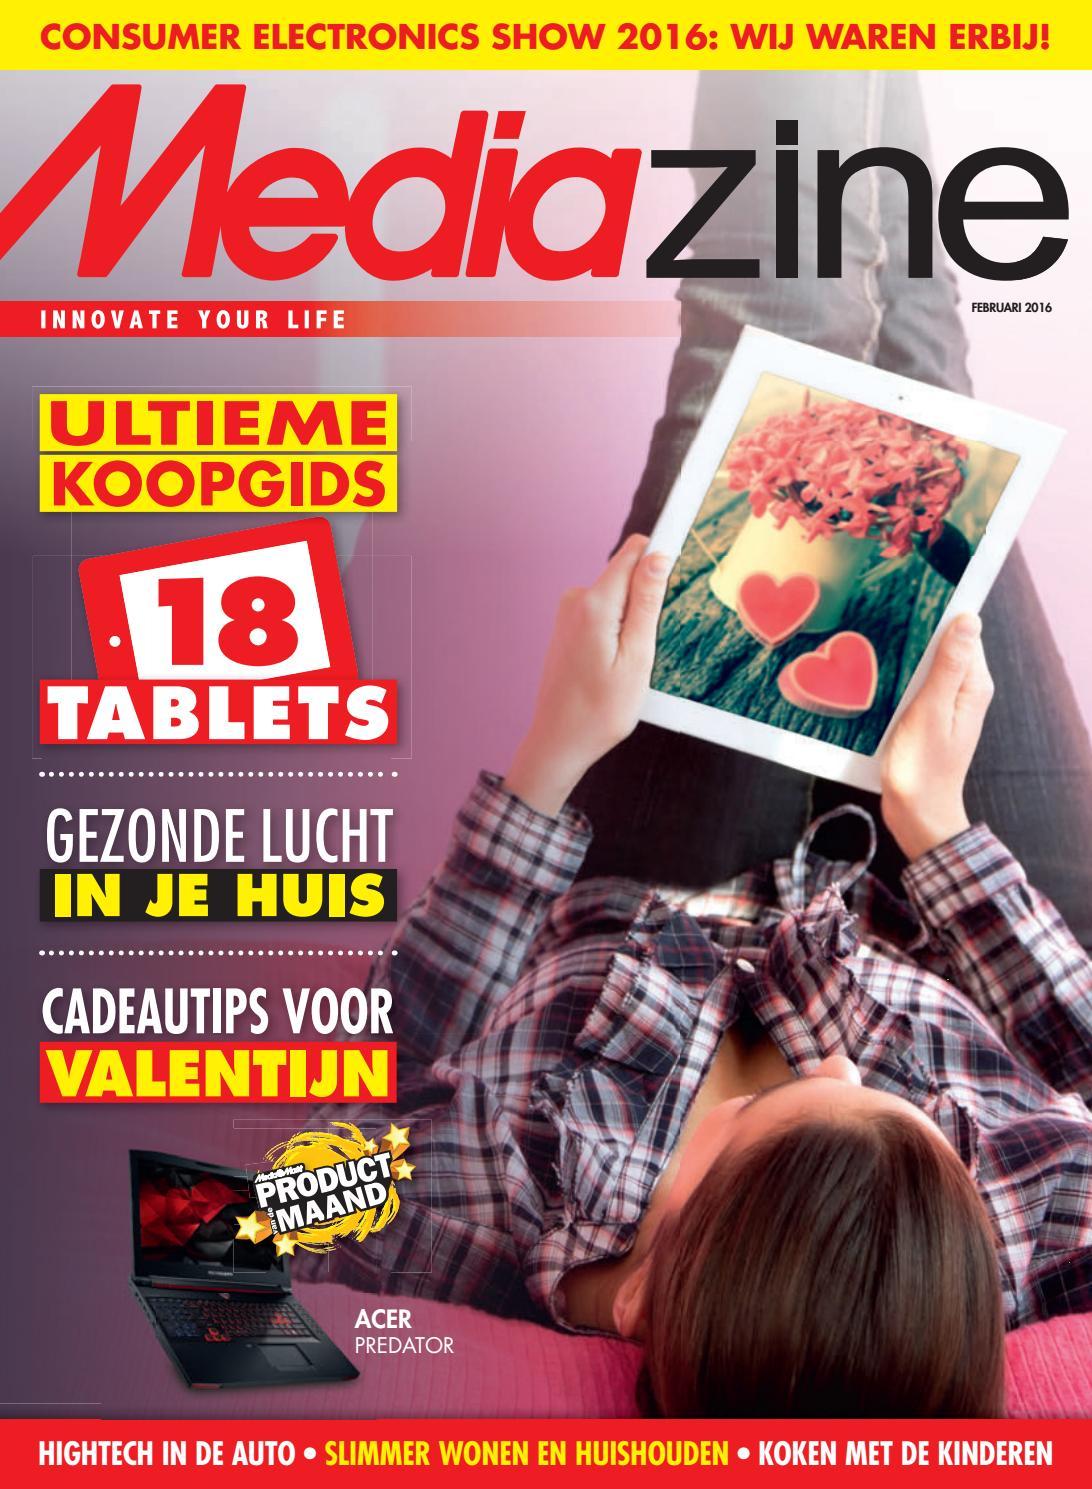 Mediazine belgië februari 2016 by mediazine belgië/belgique   issuu